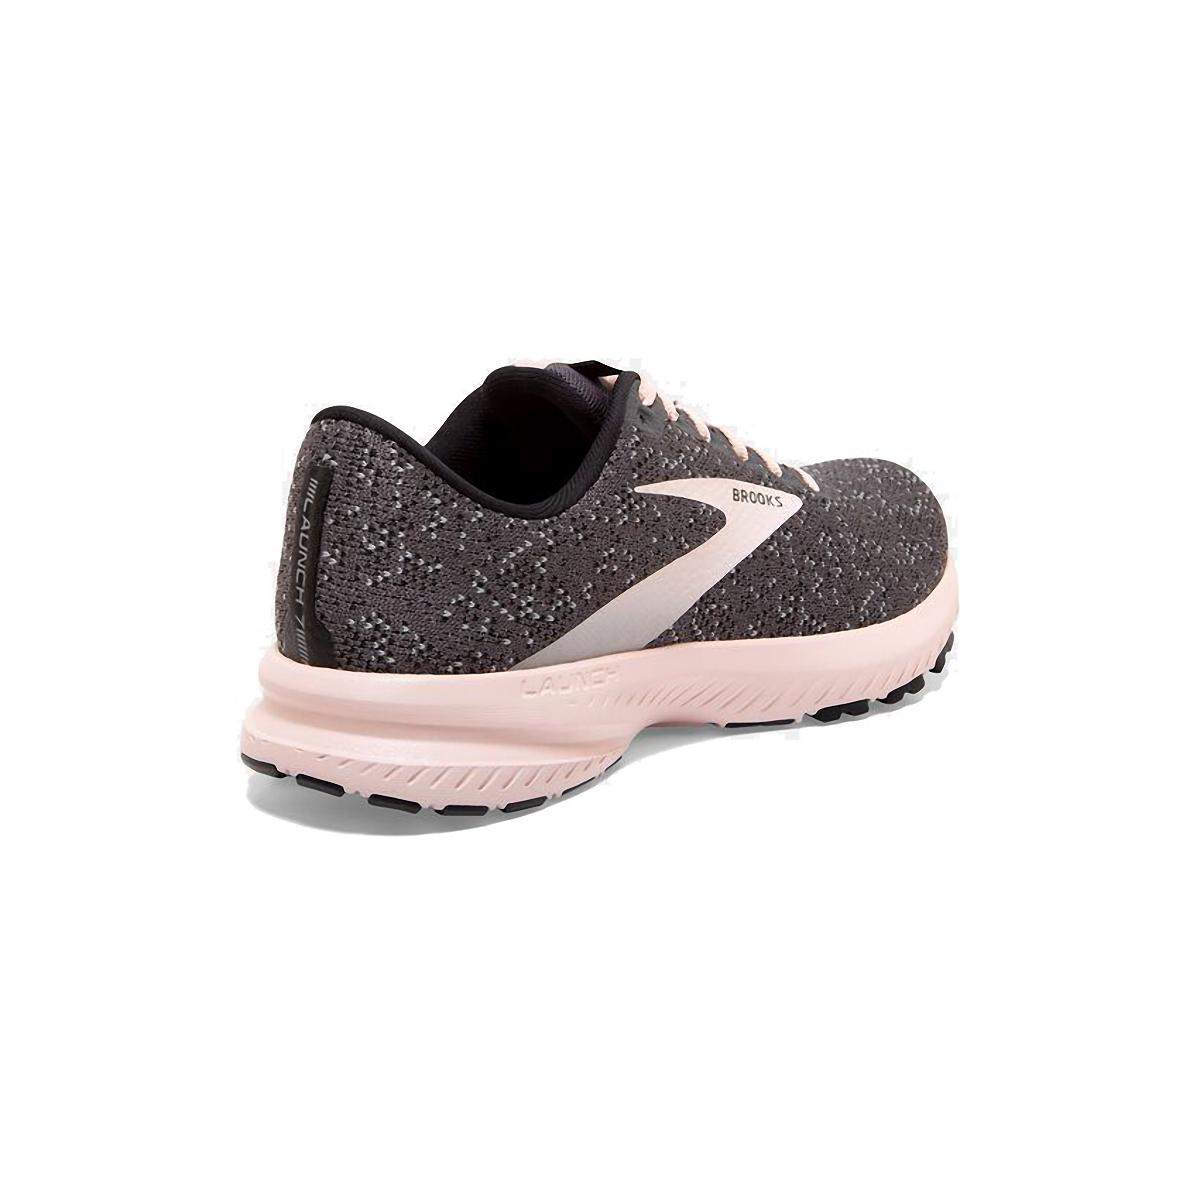 Women's Brooks Launch 7 Running Shoe - Color: Black/Pearl/Pink - Size: 5 - Width: Regular, Black/Pearl/Pink, large, image 4